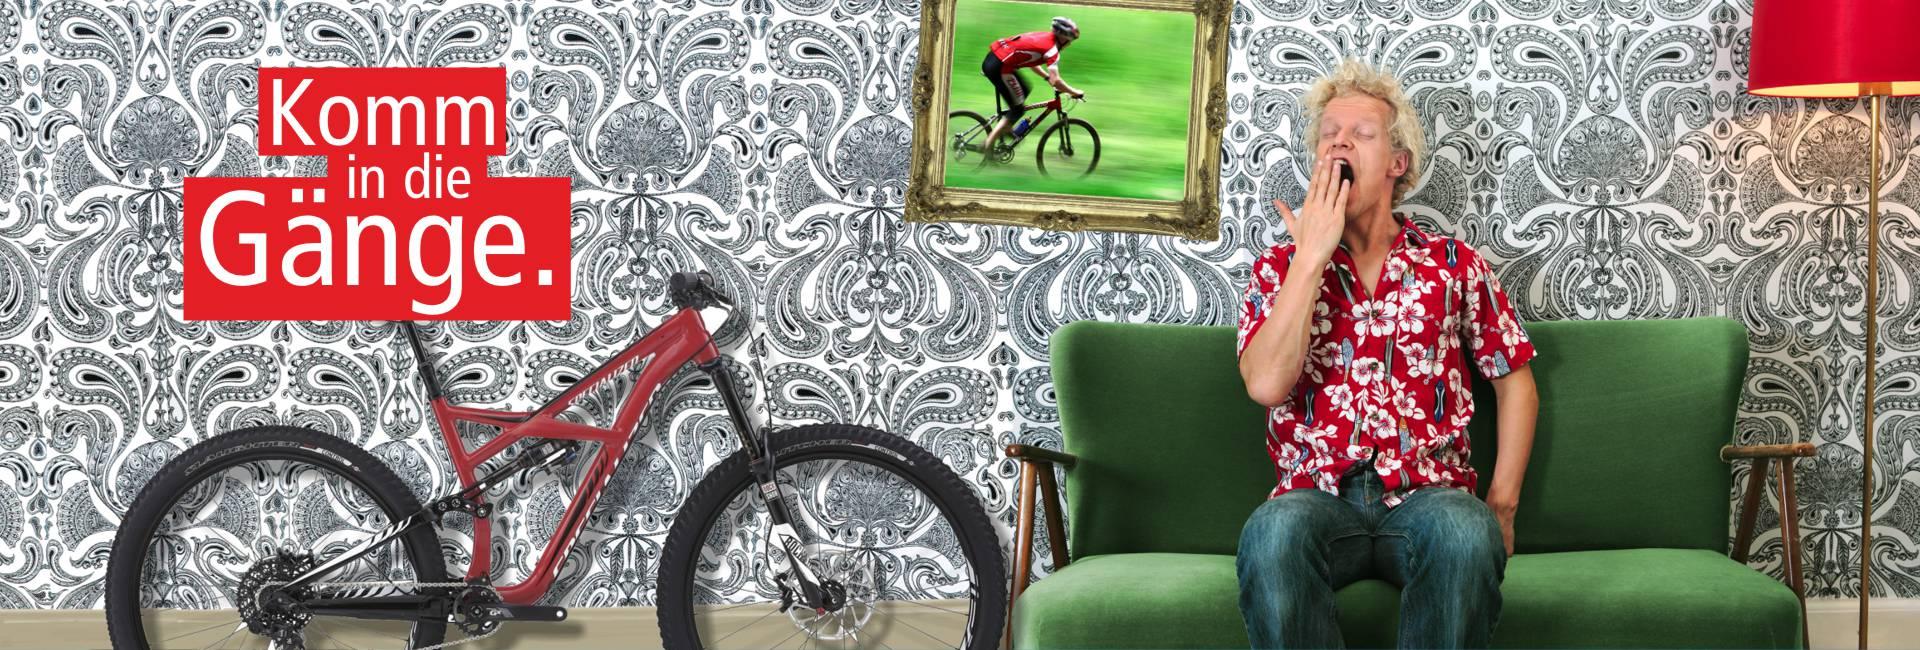 Bikesnboards Fahrrad Shop